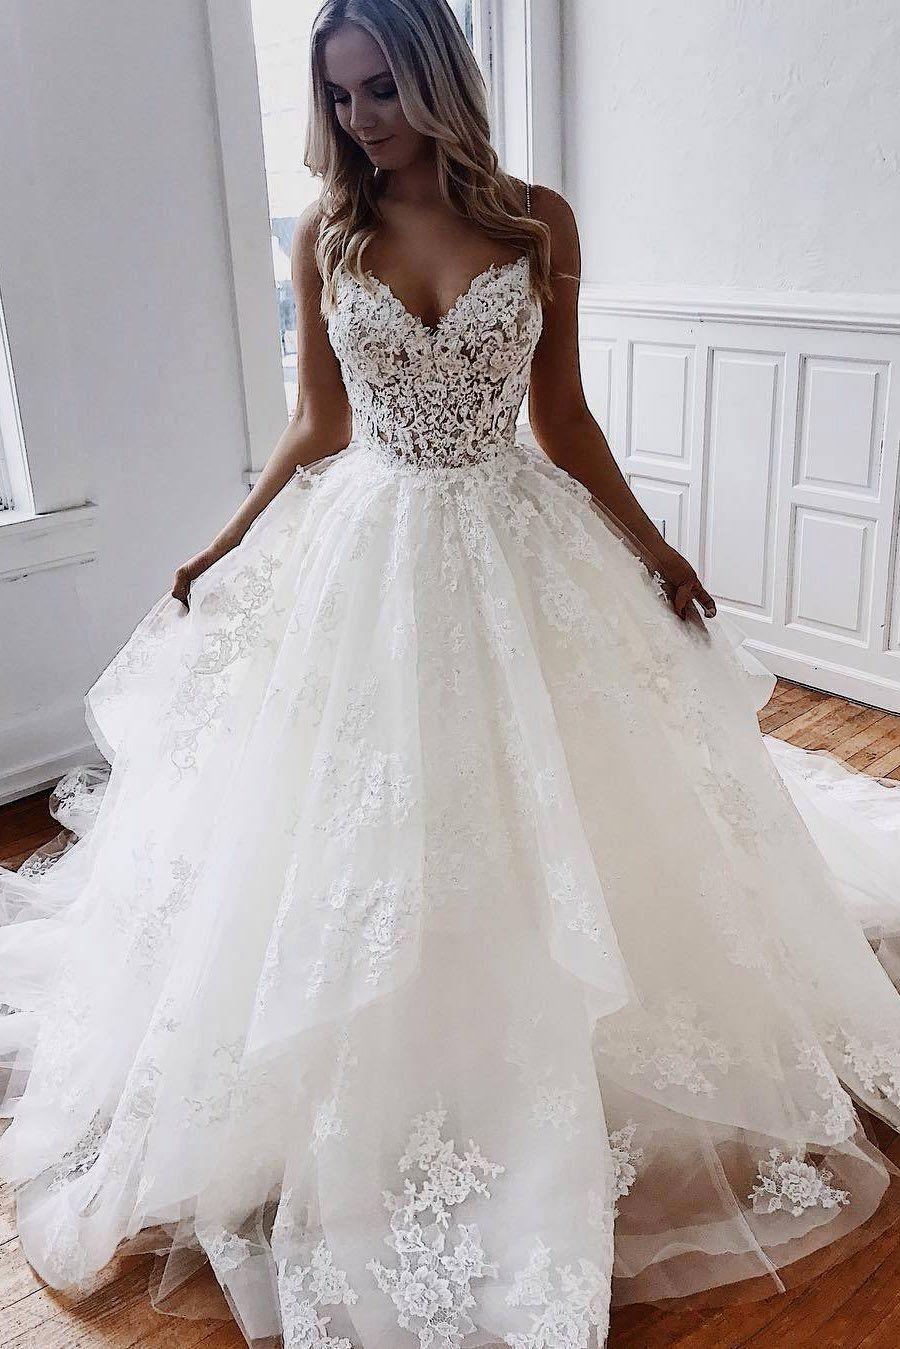 Cheap Wedding Gowns 2018 Top Wedding Dresses Ball Gown Wedding Dress Bridal Gowns Mermaid [ 1349 x 900 Pixel ]